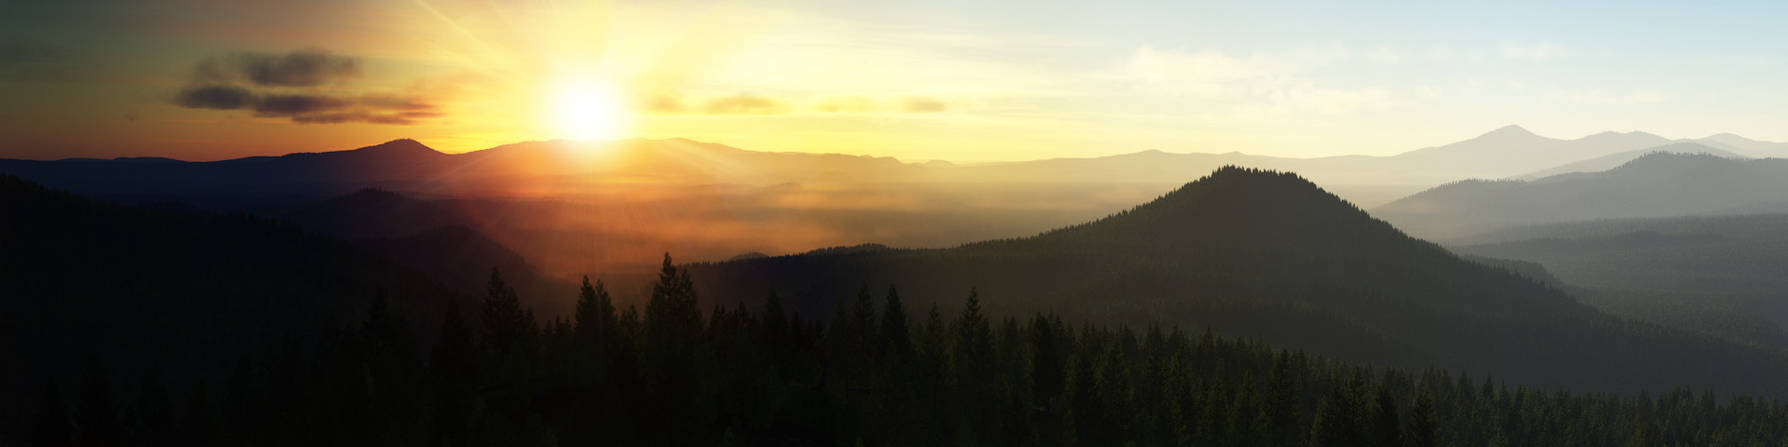 Time-lapse Panorama